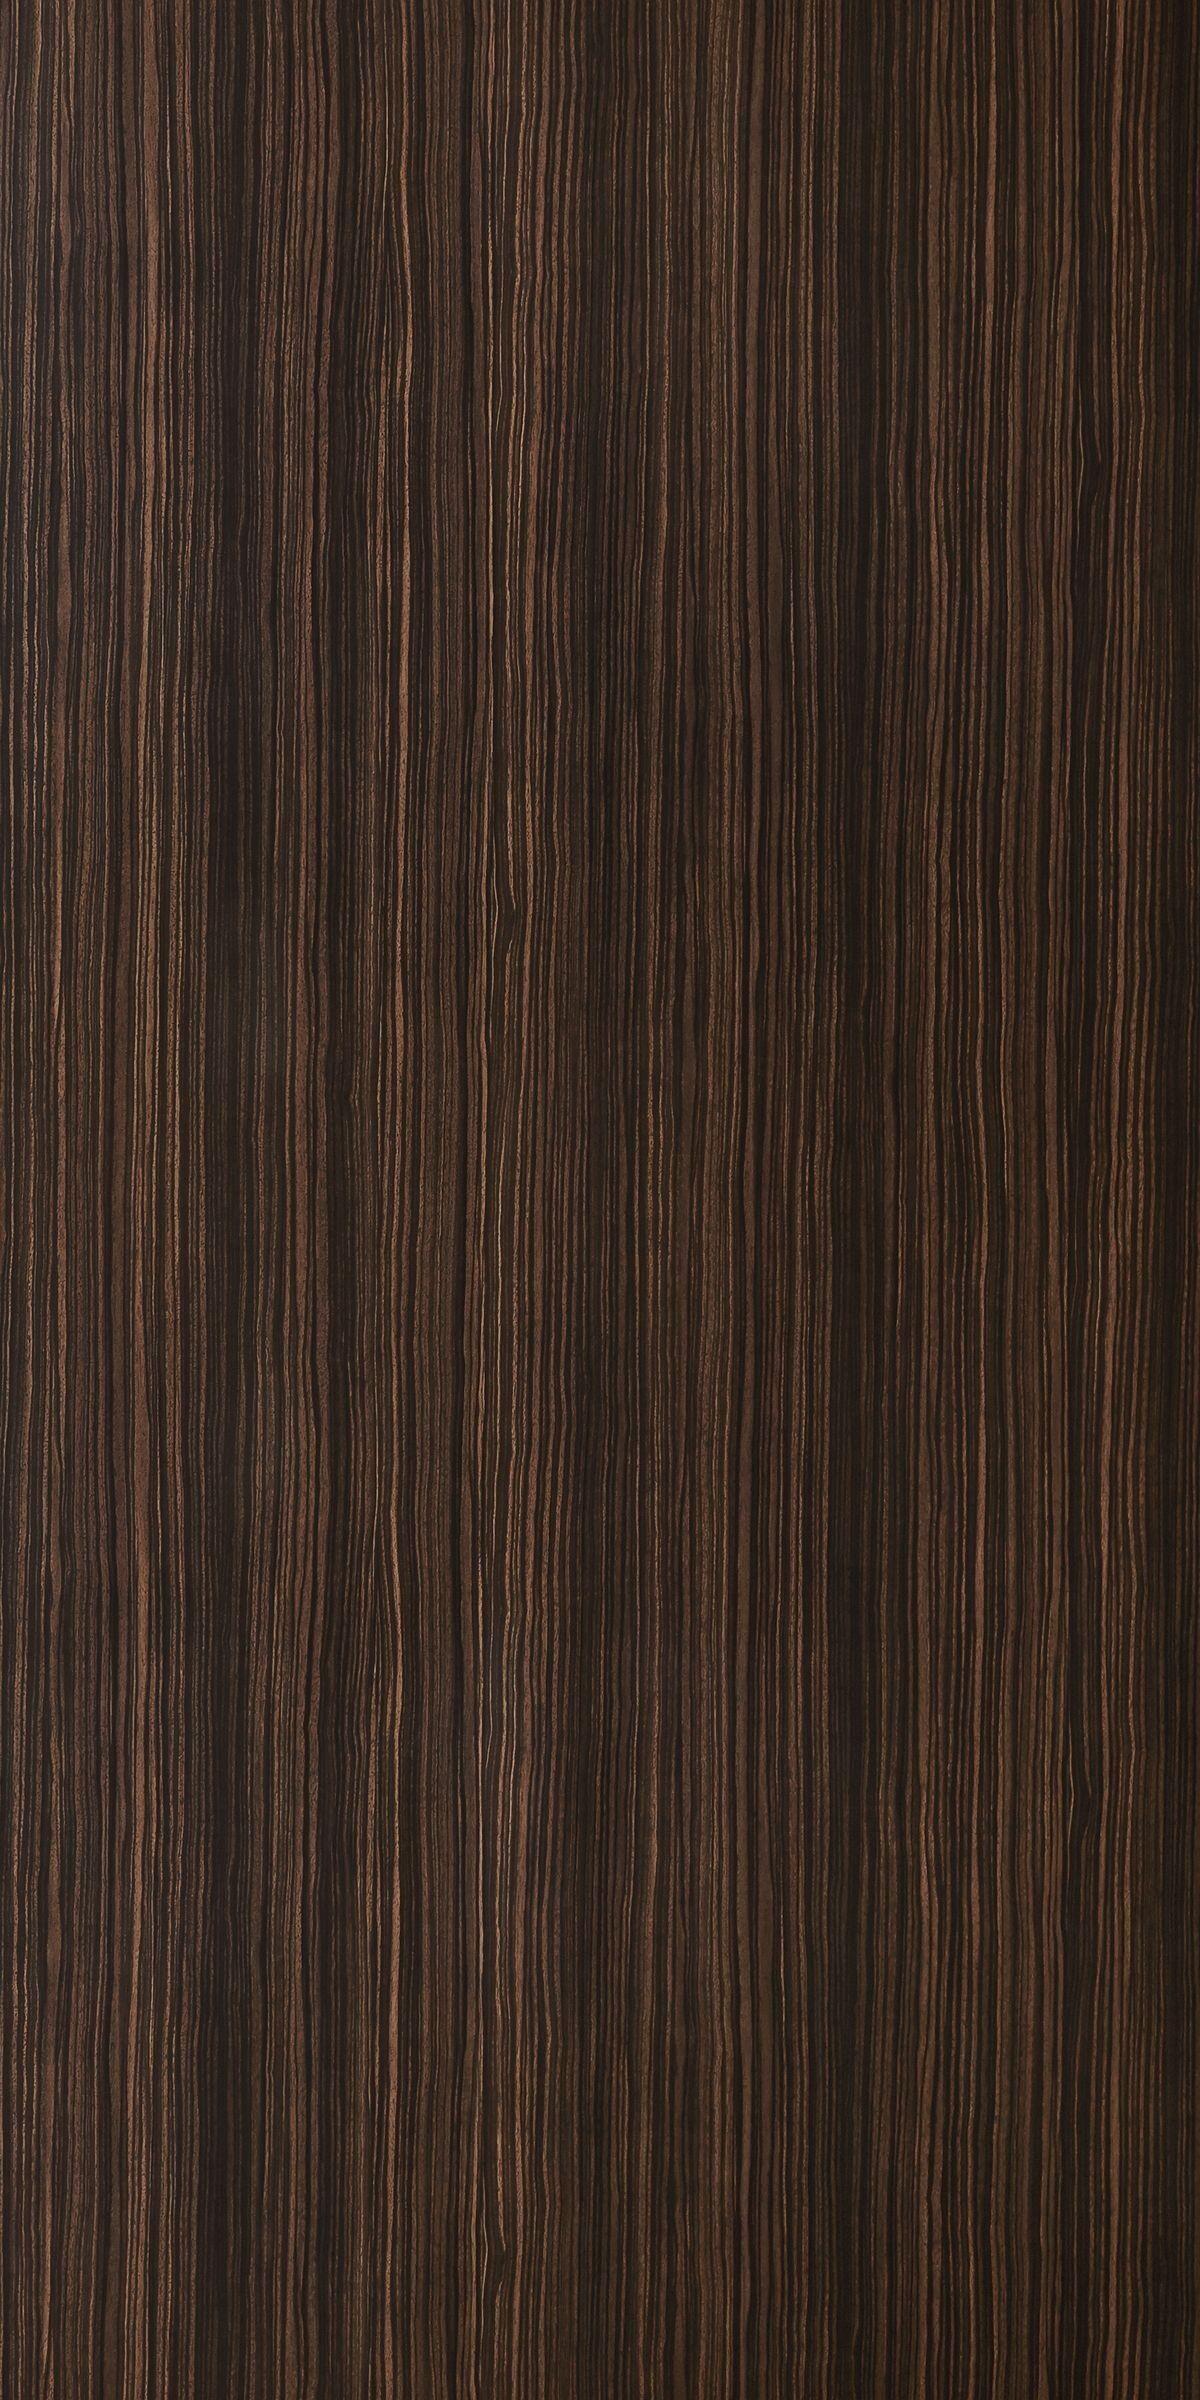 Dark Rift Wood Wood Texture In 2019 Veneer Texture